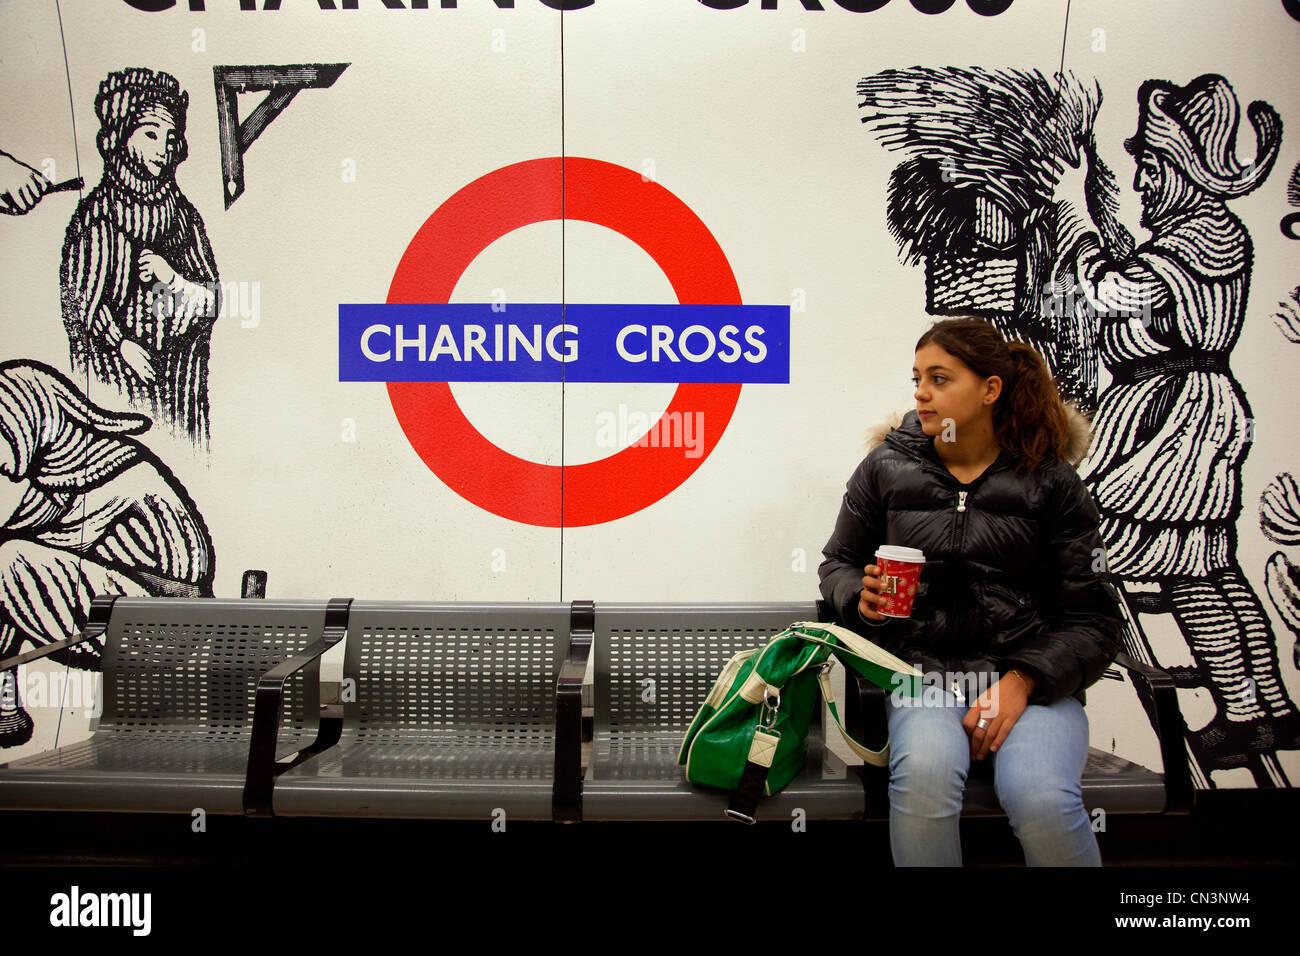 United Kingdom, London, Charing Cross underground station, 16 year oldgirl - Stock Image